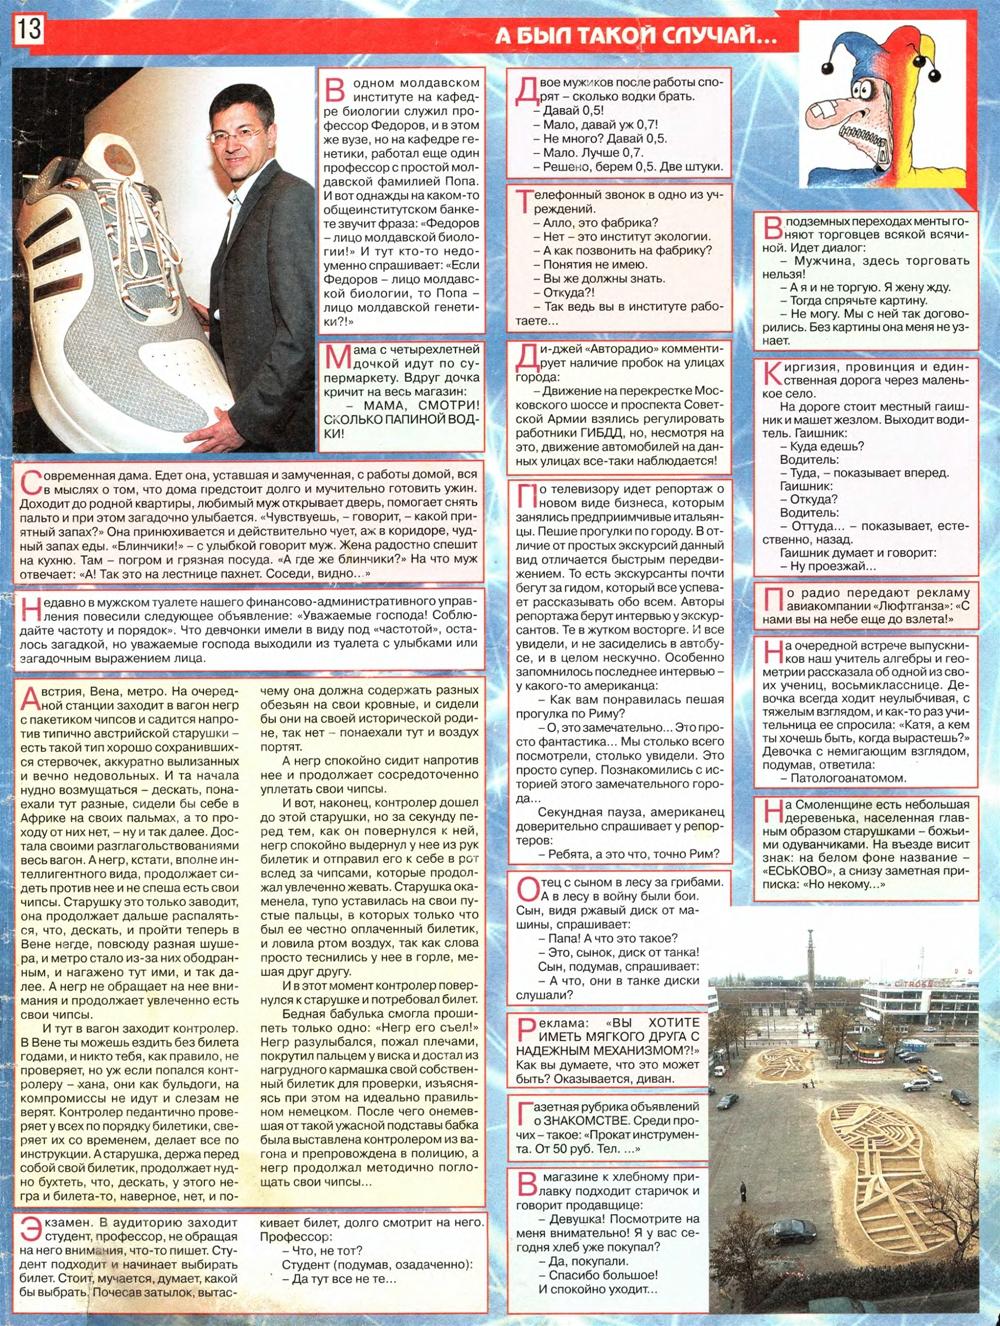 http://i2.imageban.ru/out/2013/12/21/4db1c74519d5ab9f12addc3cd7584950.jpg